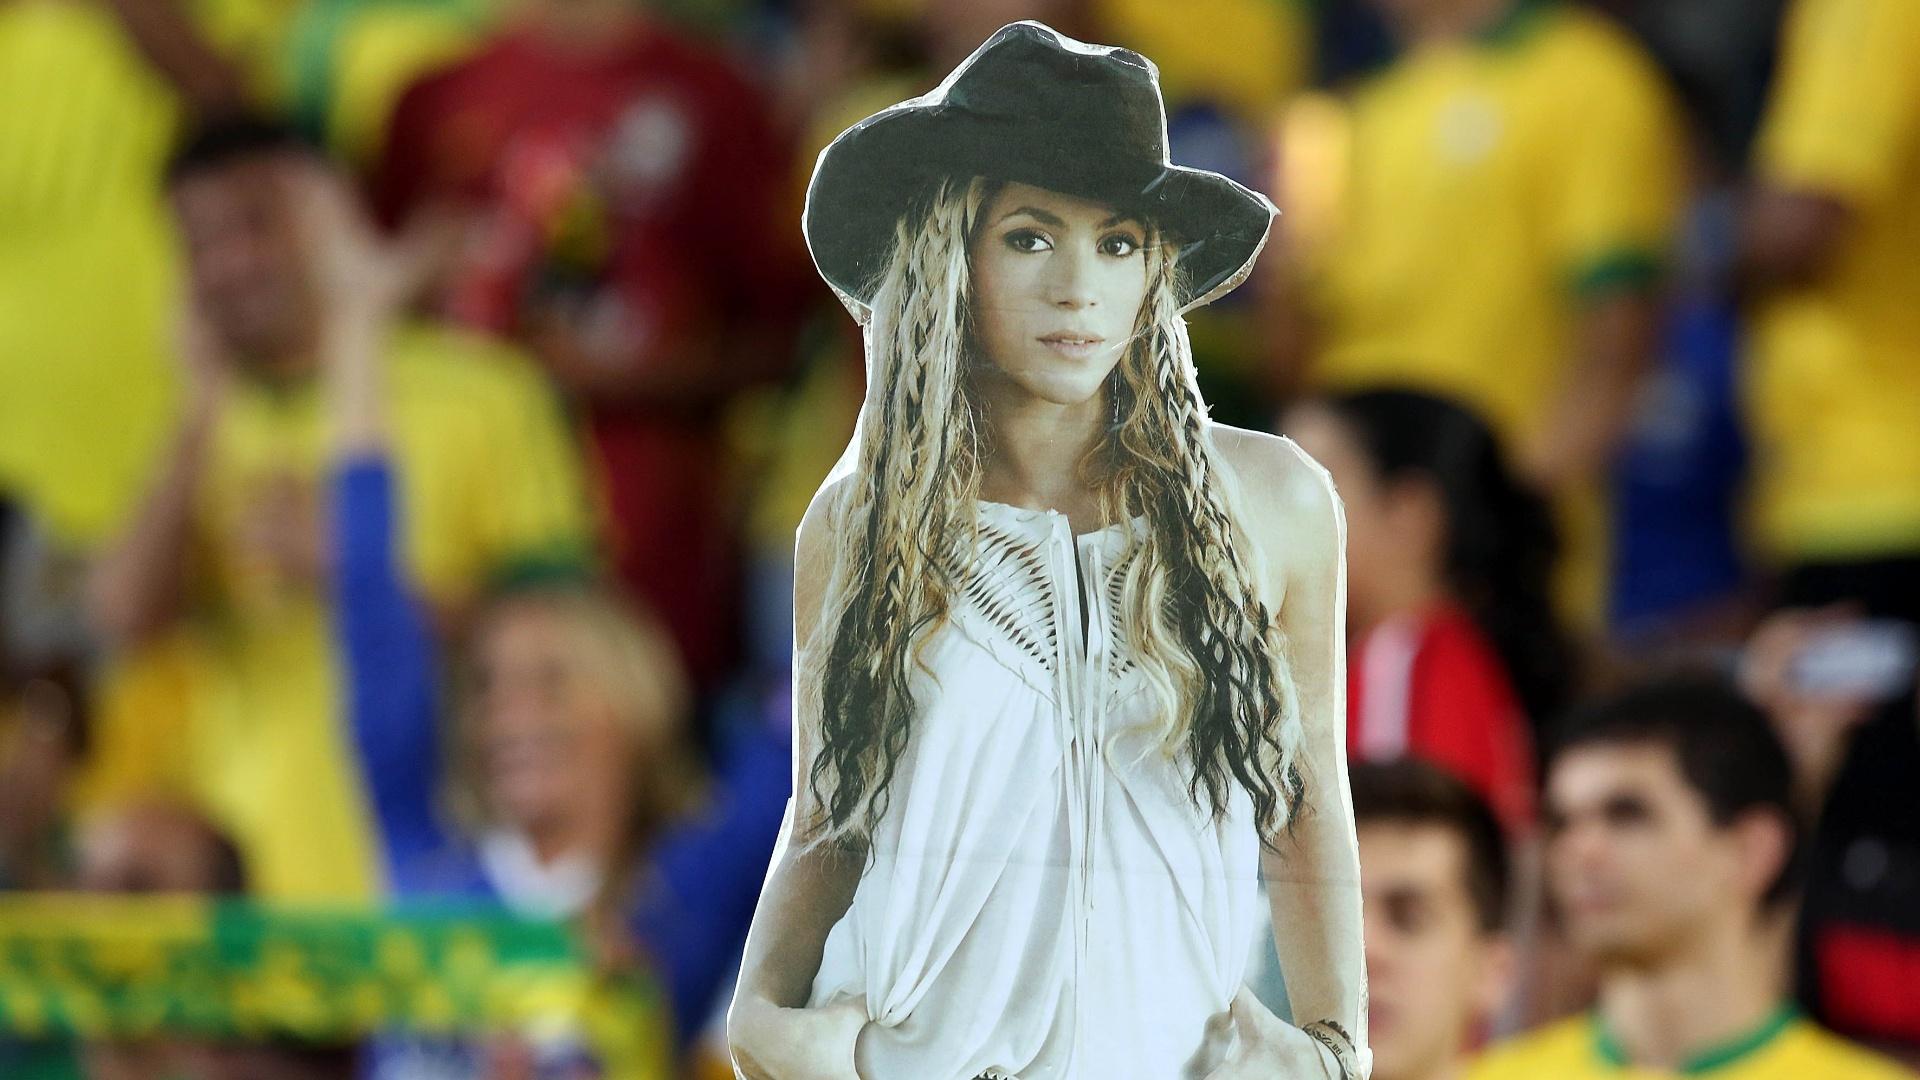 30.jun.2013 - Torcida brasileira leva cartaz da cantora Shakira para provocar seu namorado,o zagueiro espanhol Piqué